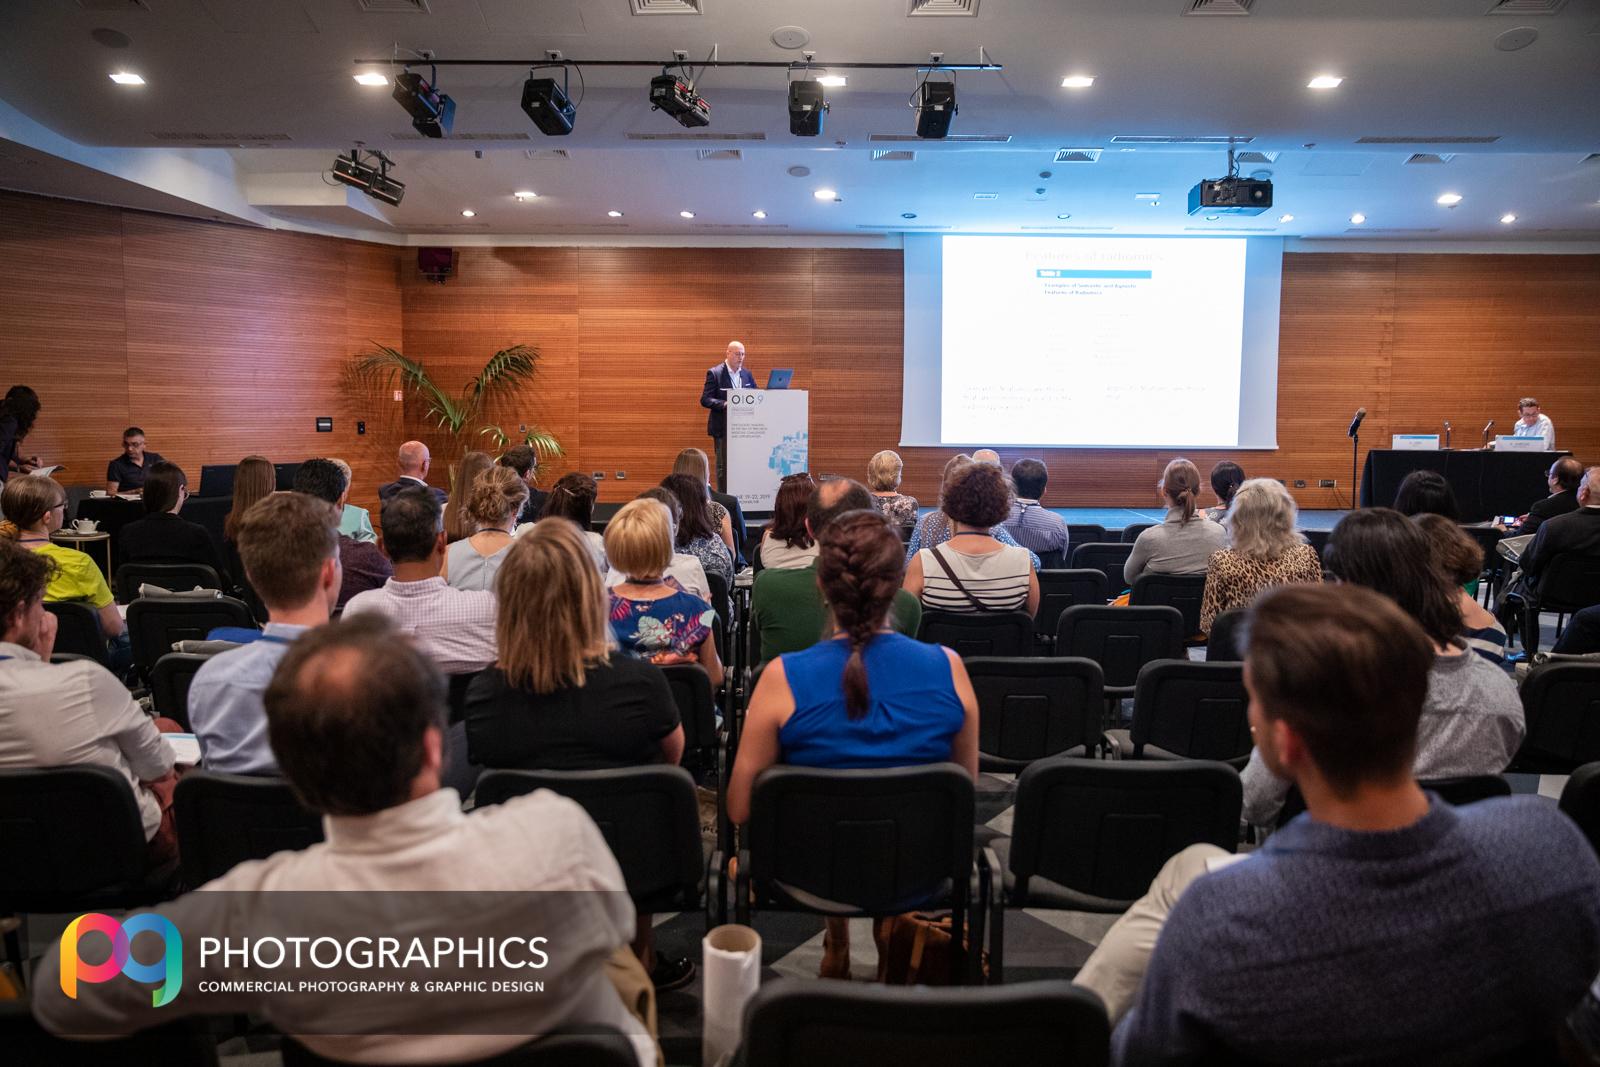 Conference-photography-edinburgh-glasgow-croatia-7.jpg